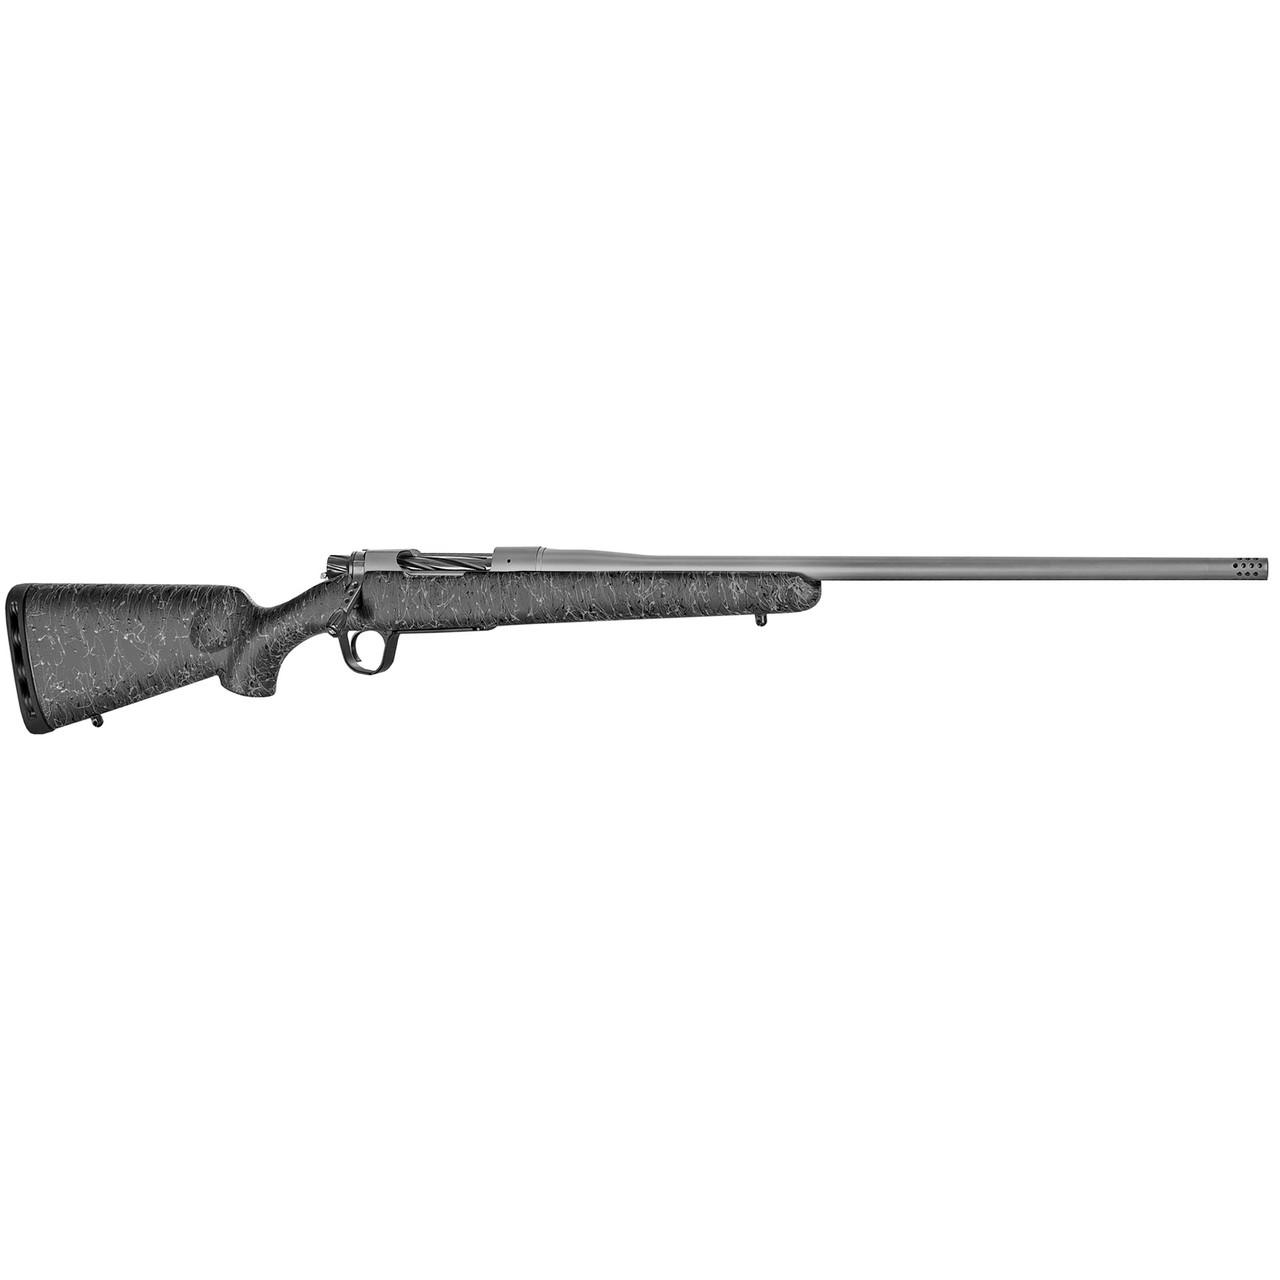 "Christensen Arms Mesa 22"" CALIFORNIA LEGAL - .308/7.62x51 - Black w/ Gray Webbing"